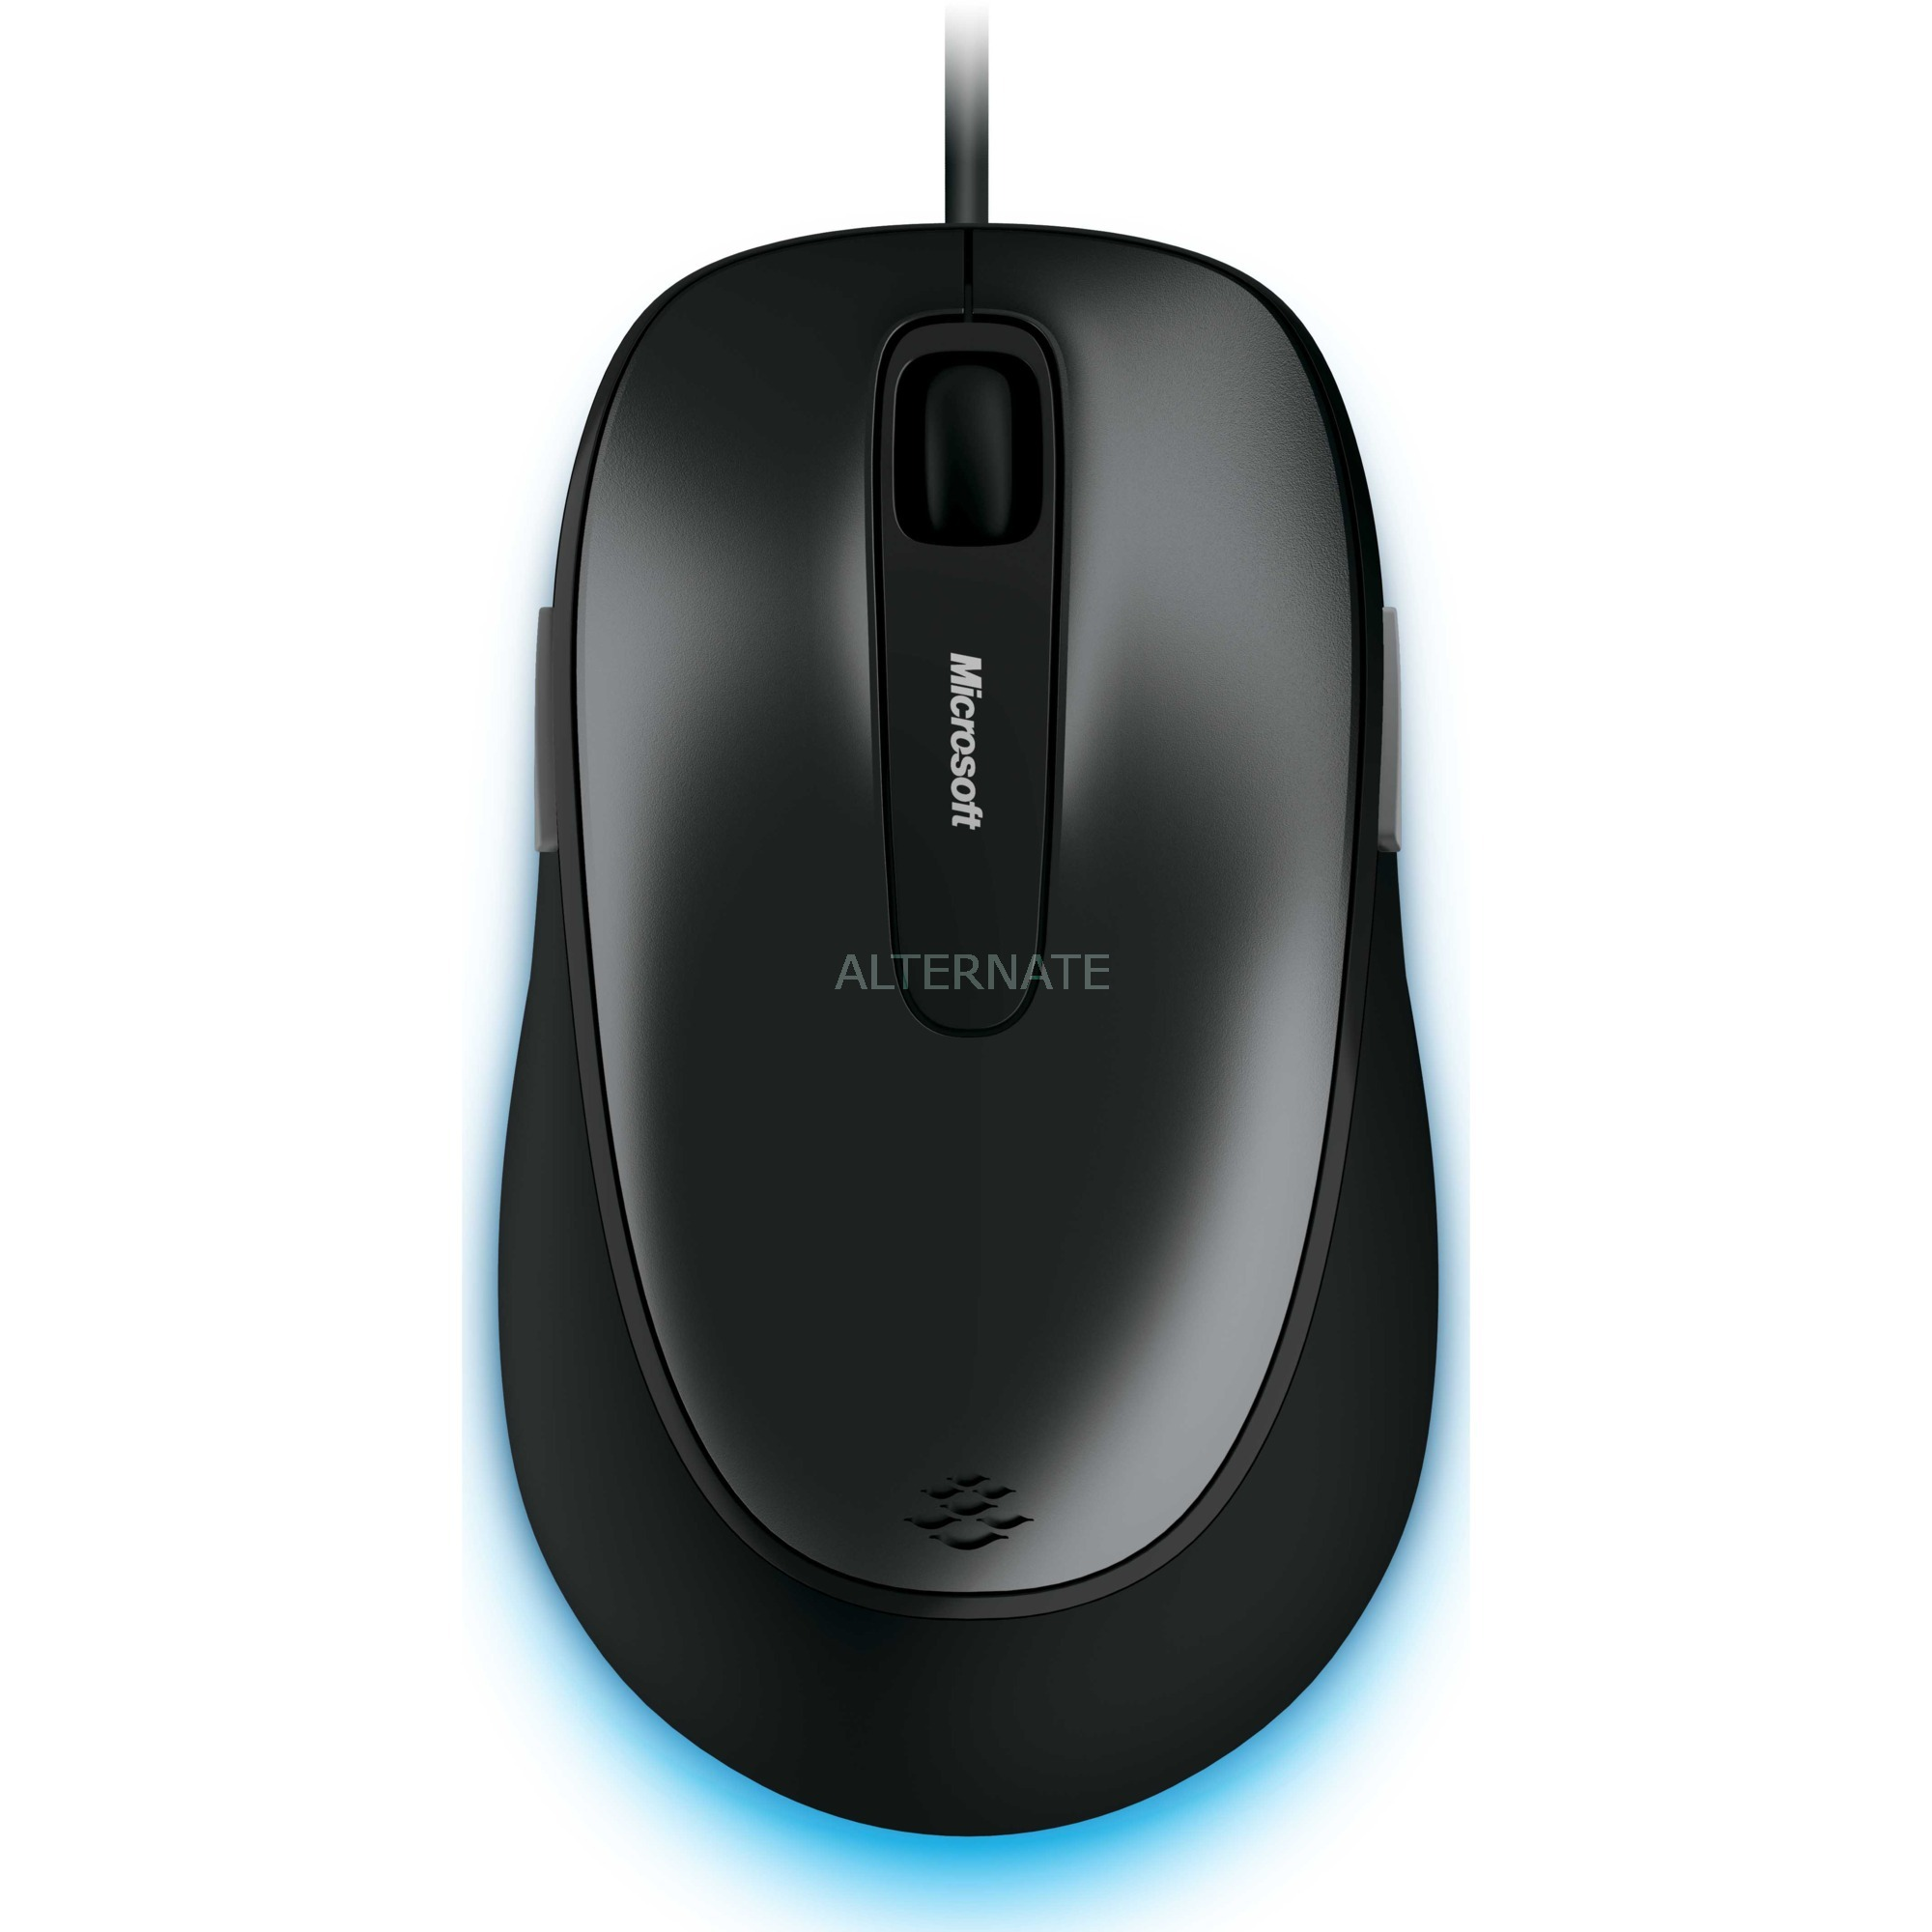 Comfort Mouse 4500 for Business ratón USB BlueTrack 1000 DPI Ambidextro Negro